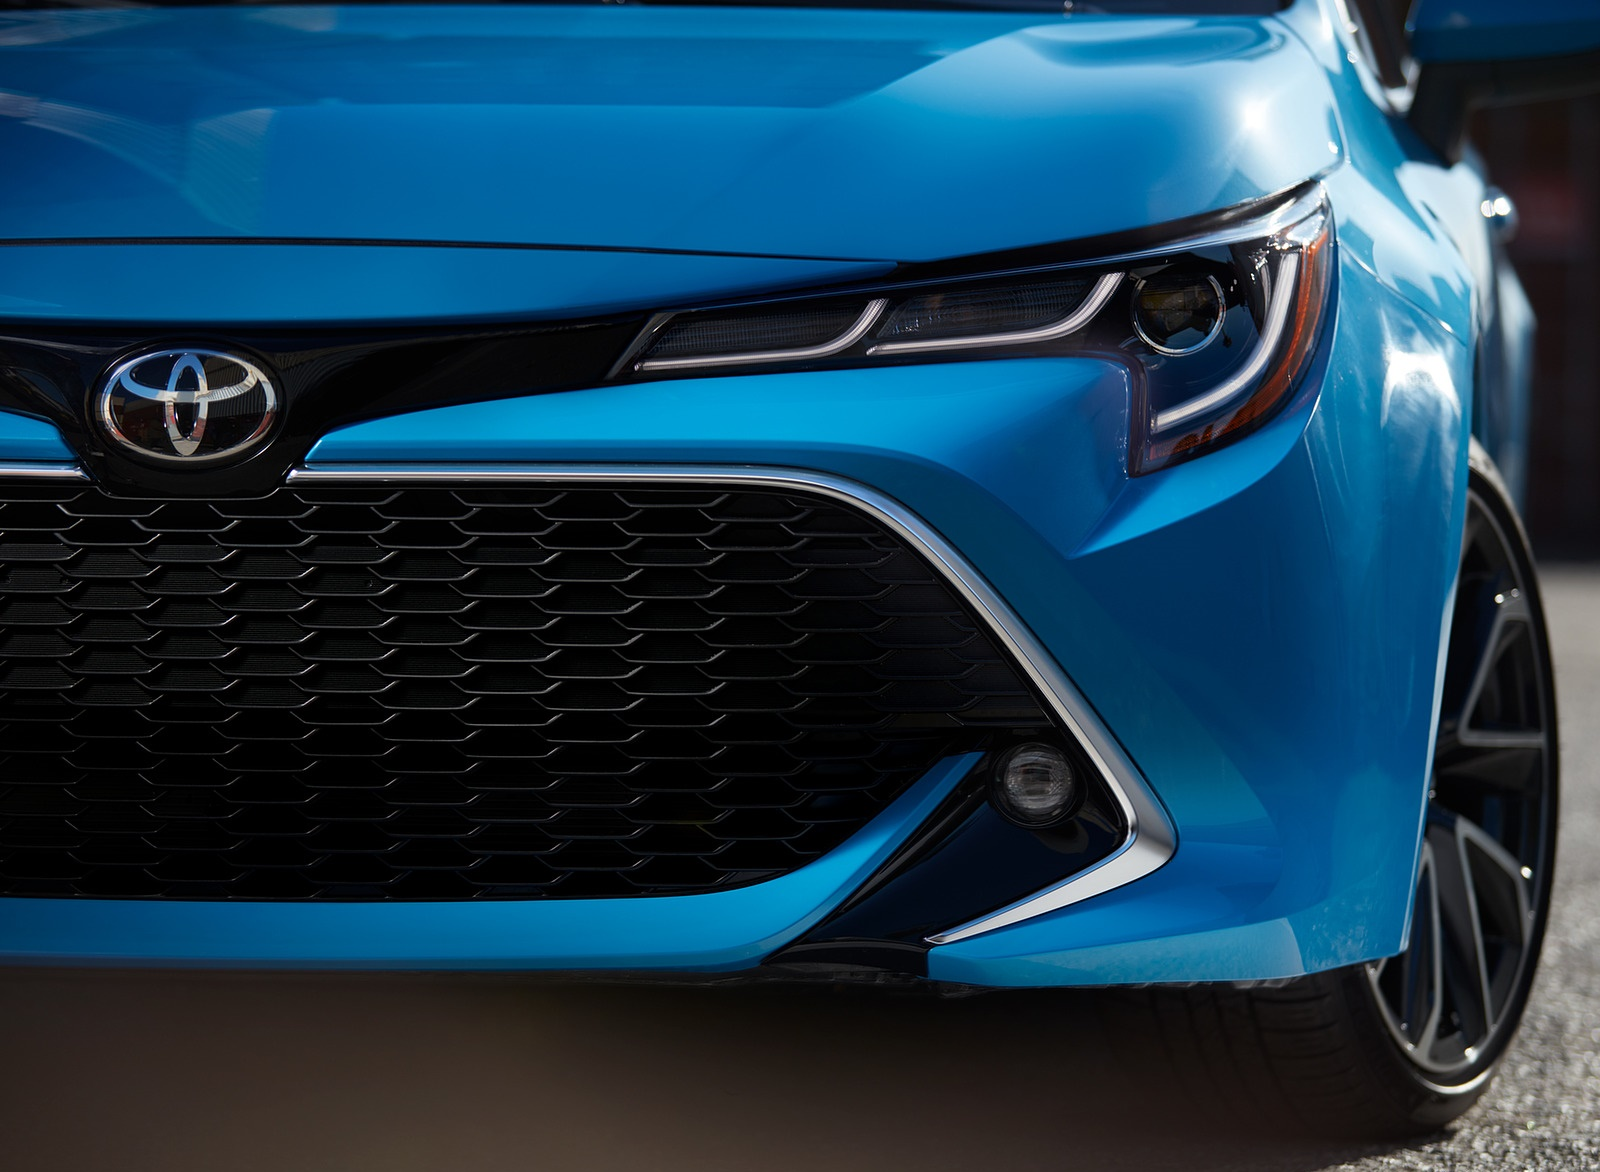 2019 Toyota Corolla Hatchback Grill Wallpaper (13)